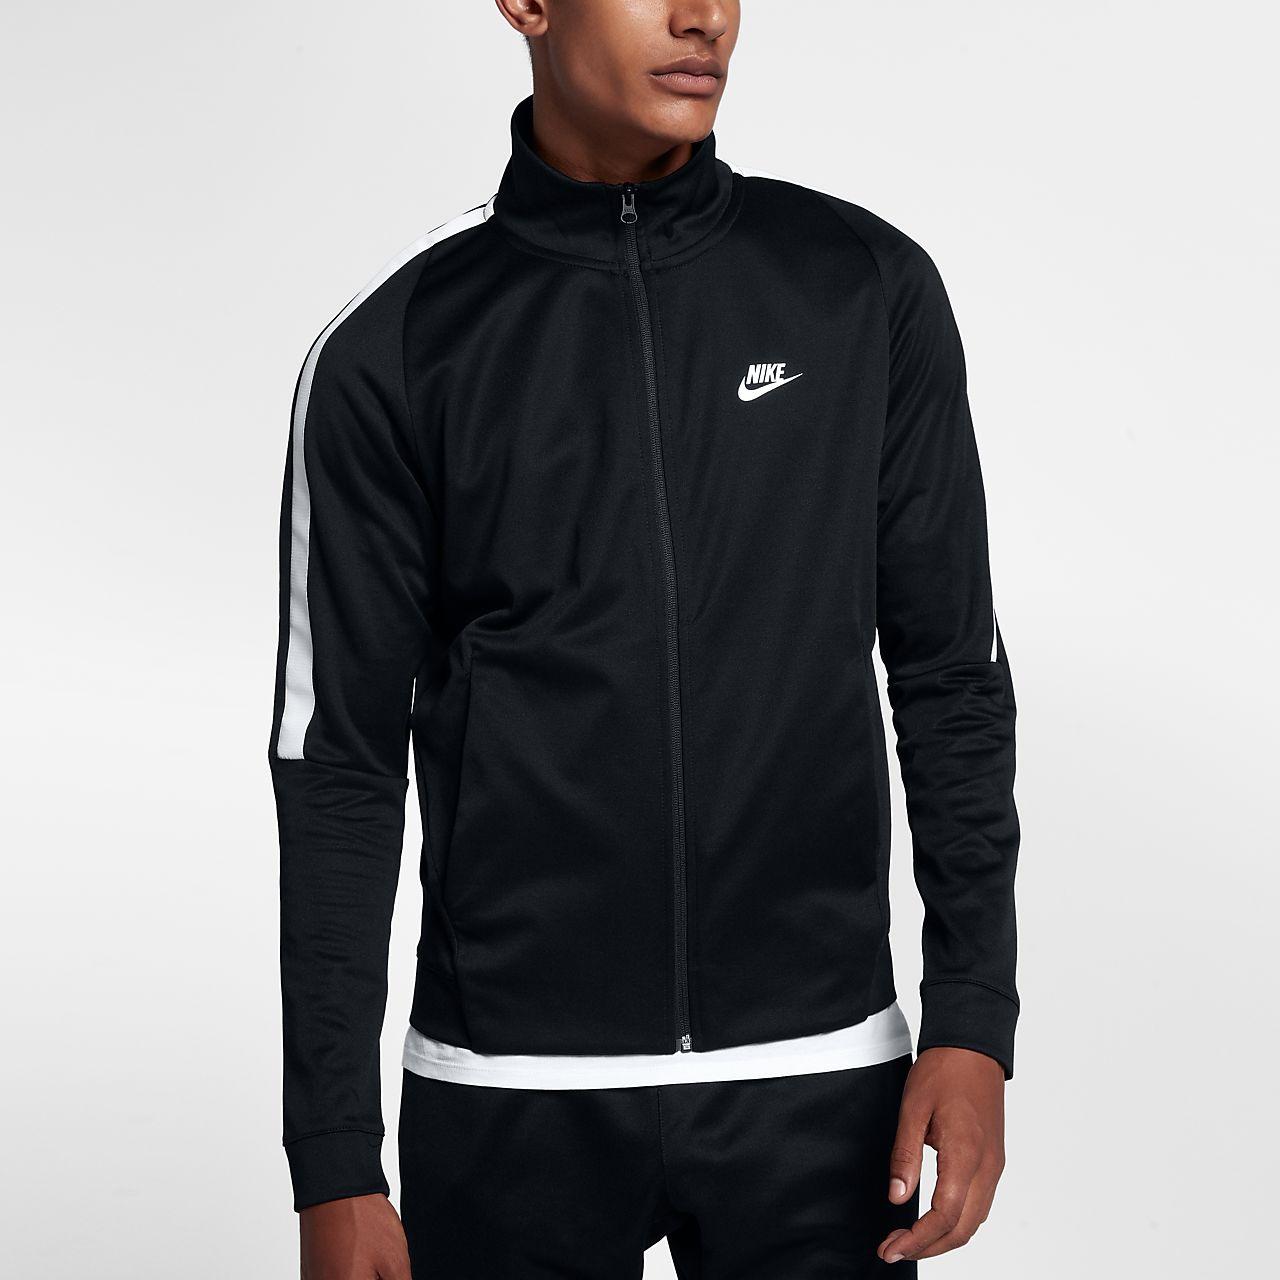 Sportswear Chaqueta Nike Wxqrnwpb N98 Es Hombre xtOHwU66